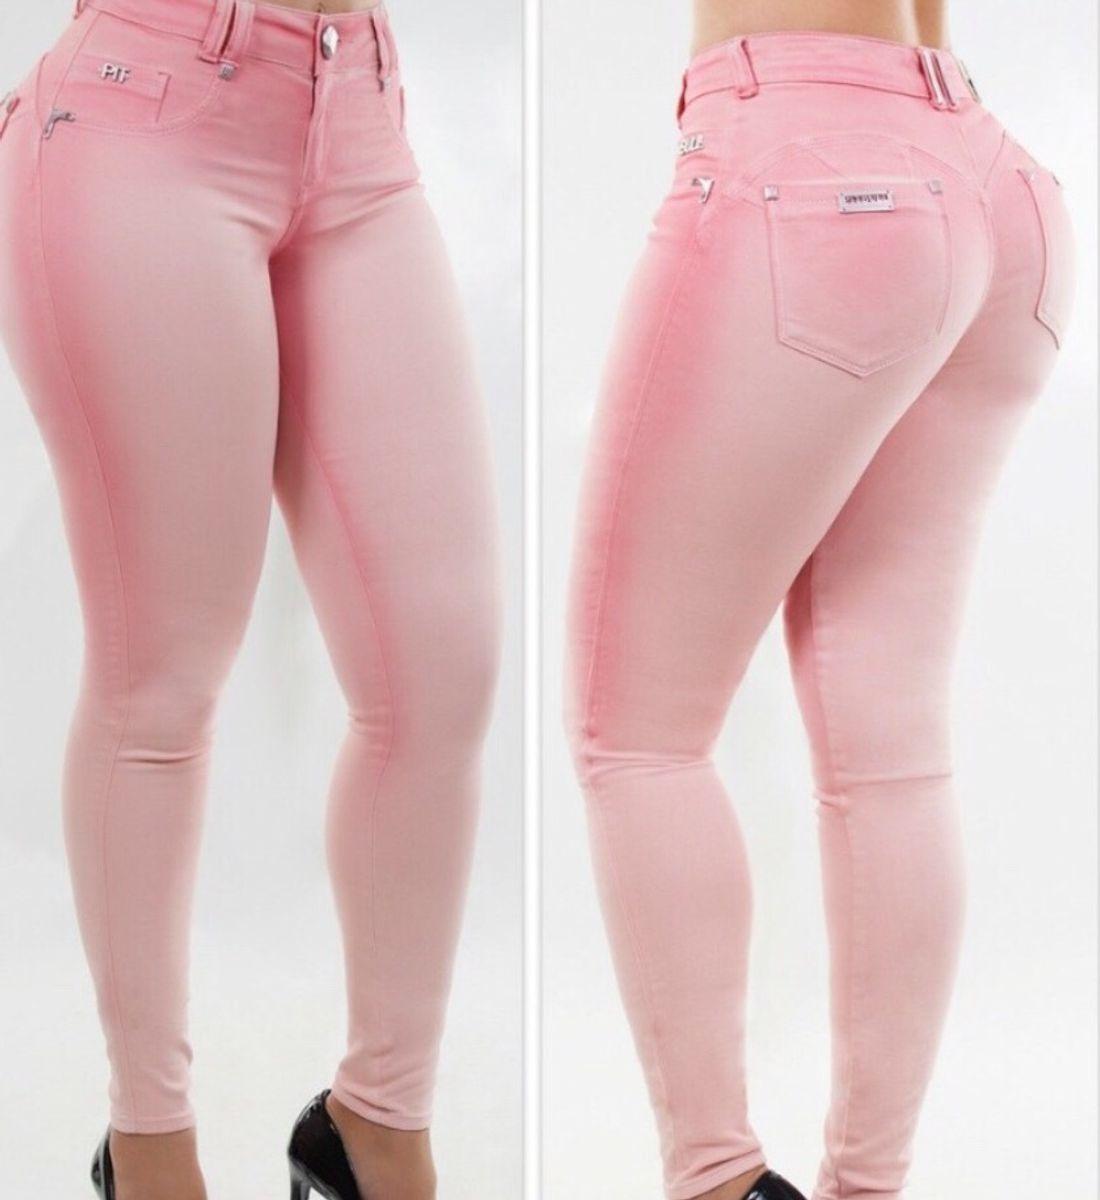 a31d8119a Calça Jeans Pitbull Original | Calça Feminina Pit Bull Jeans Nunca ...